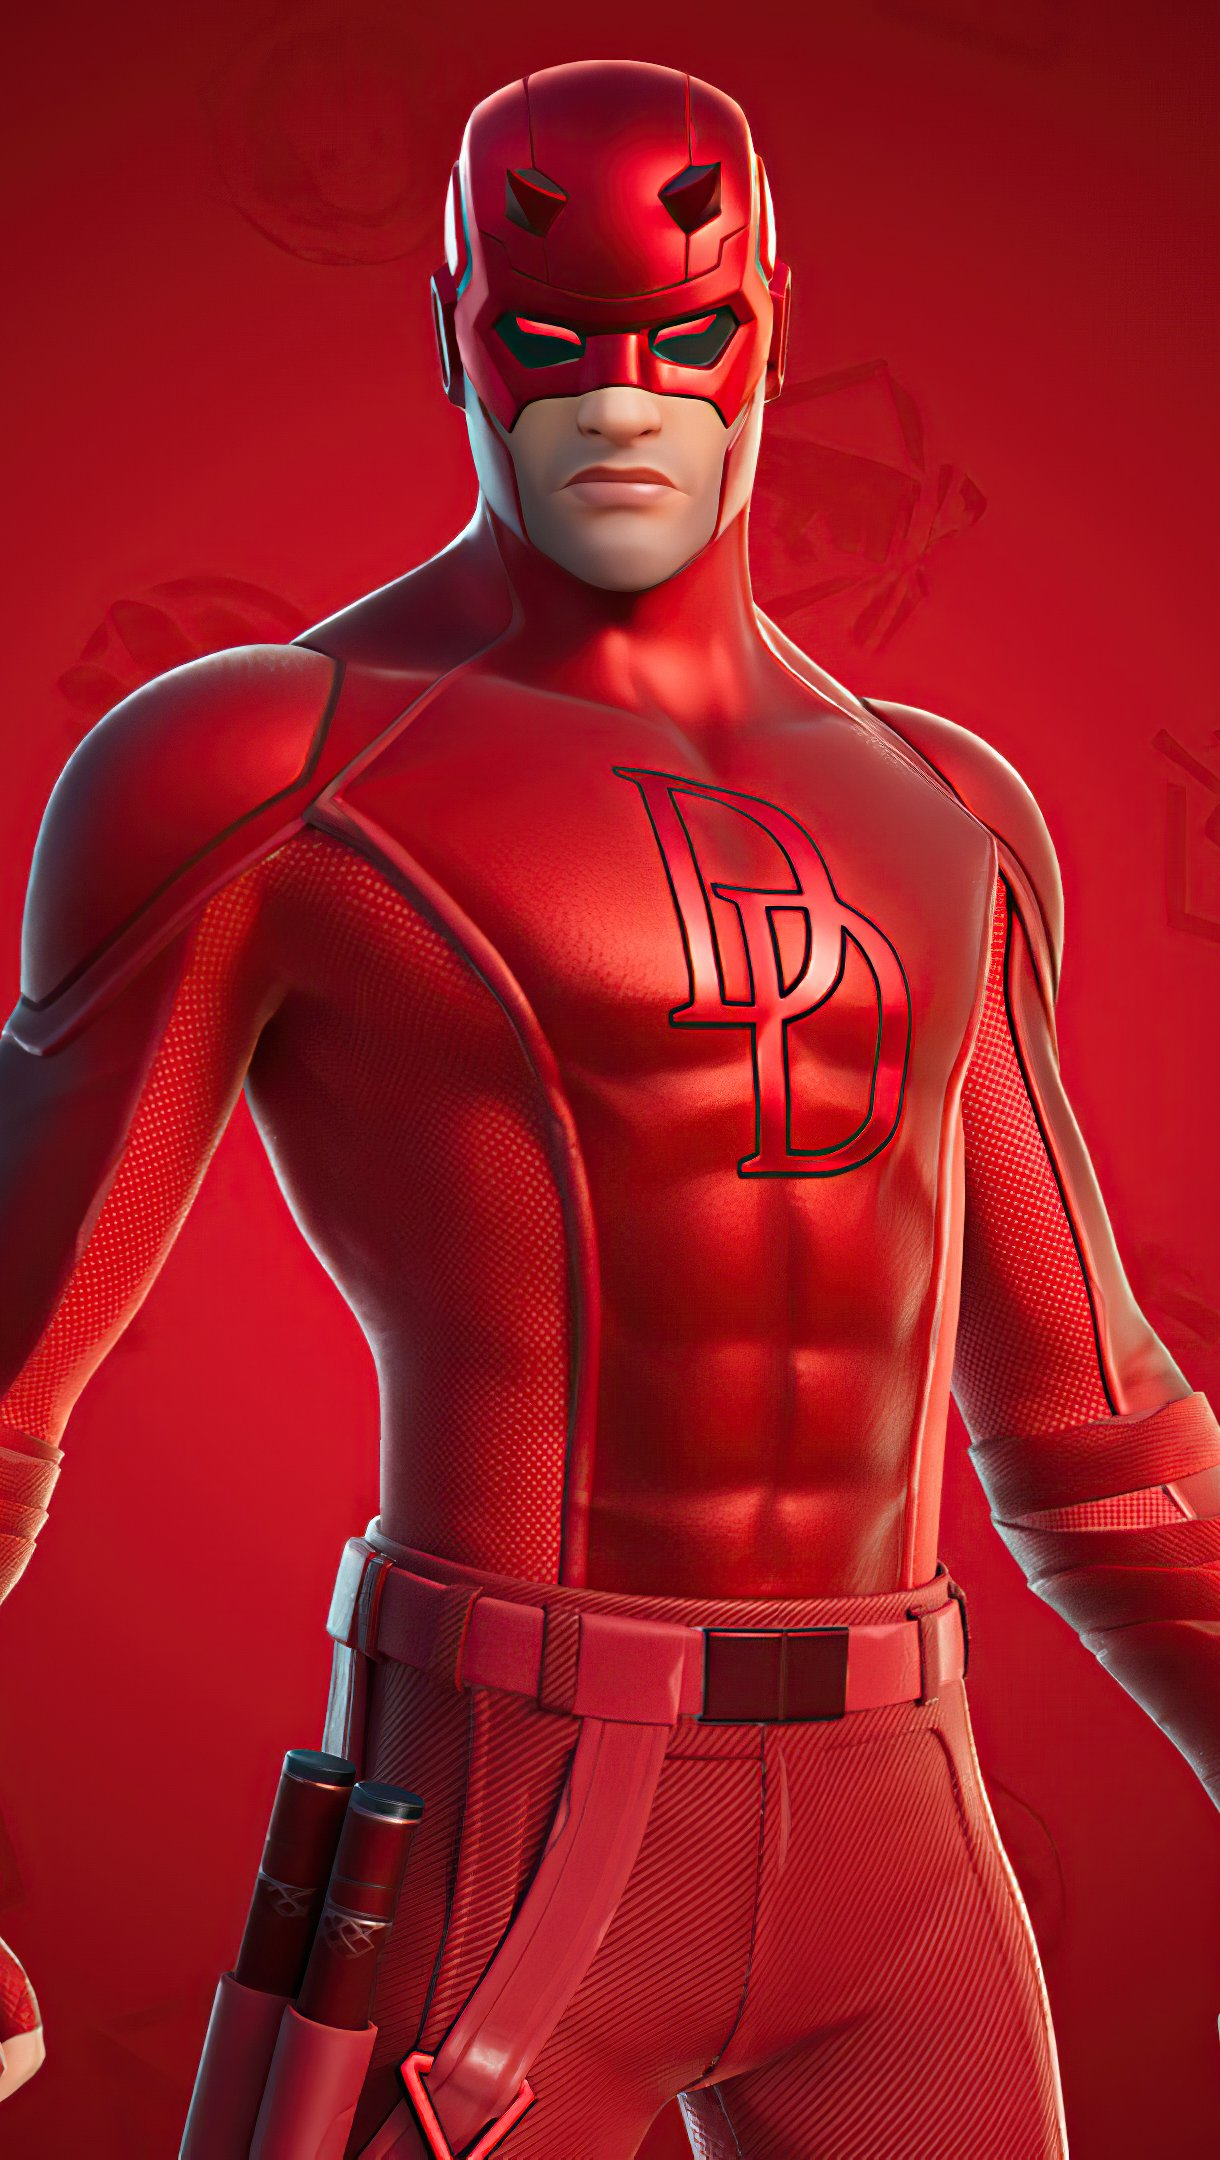 Wallpaper Daredevil Fortnite Style 2020 Vertical